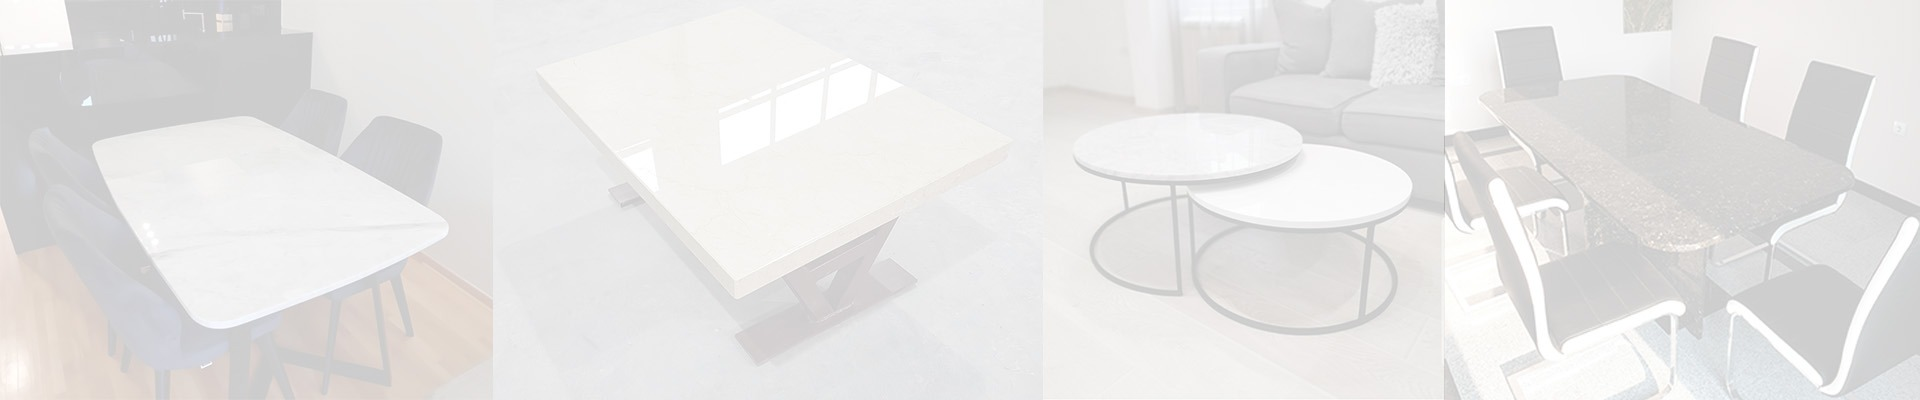 Klub stolovi Mermeri i Graniti Ilić